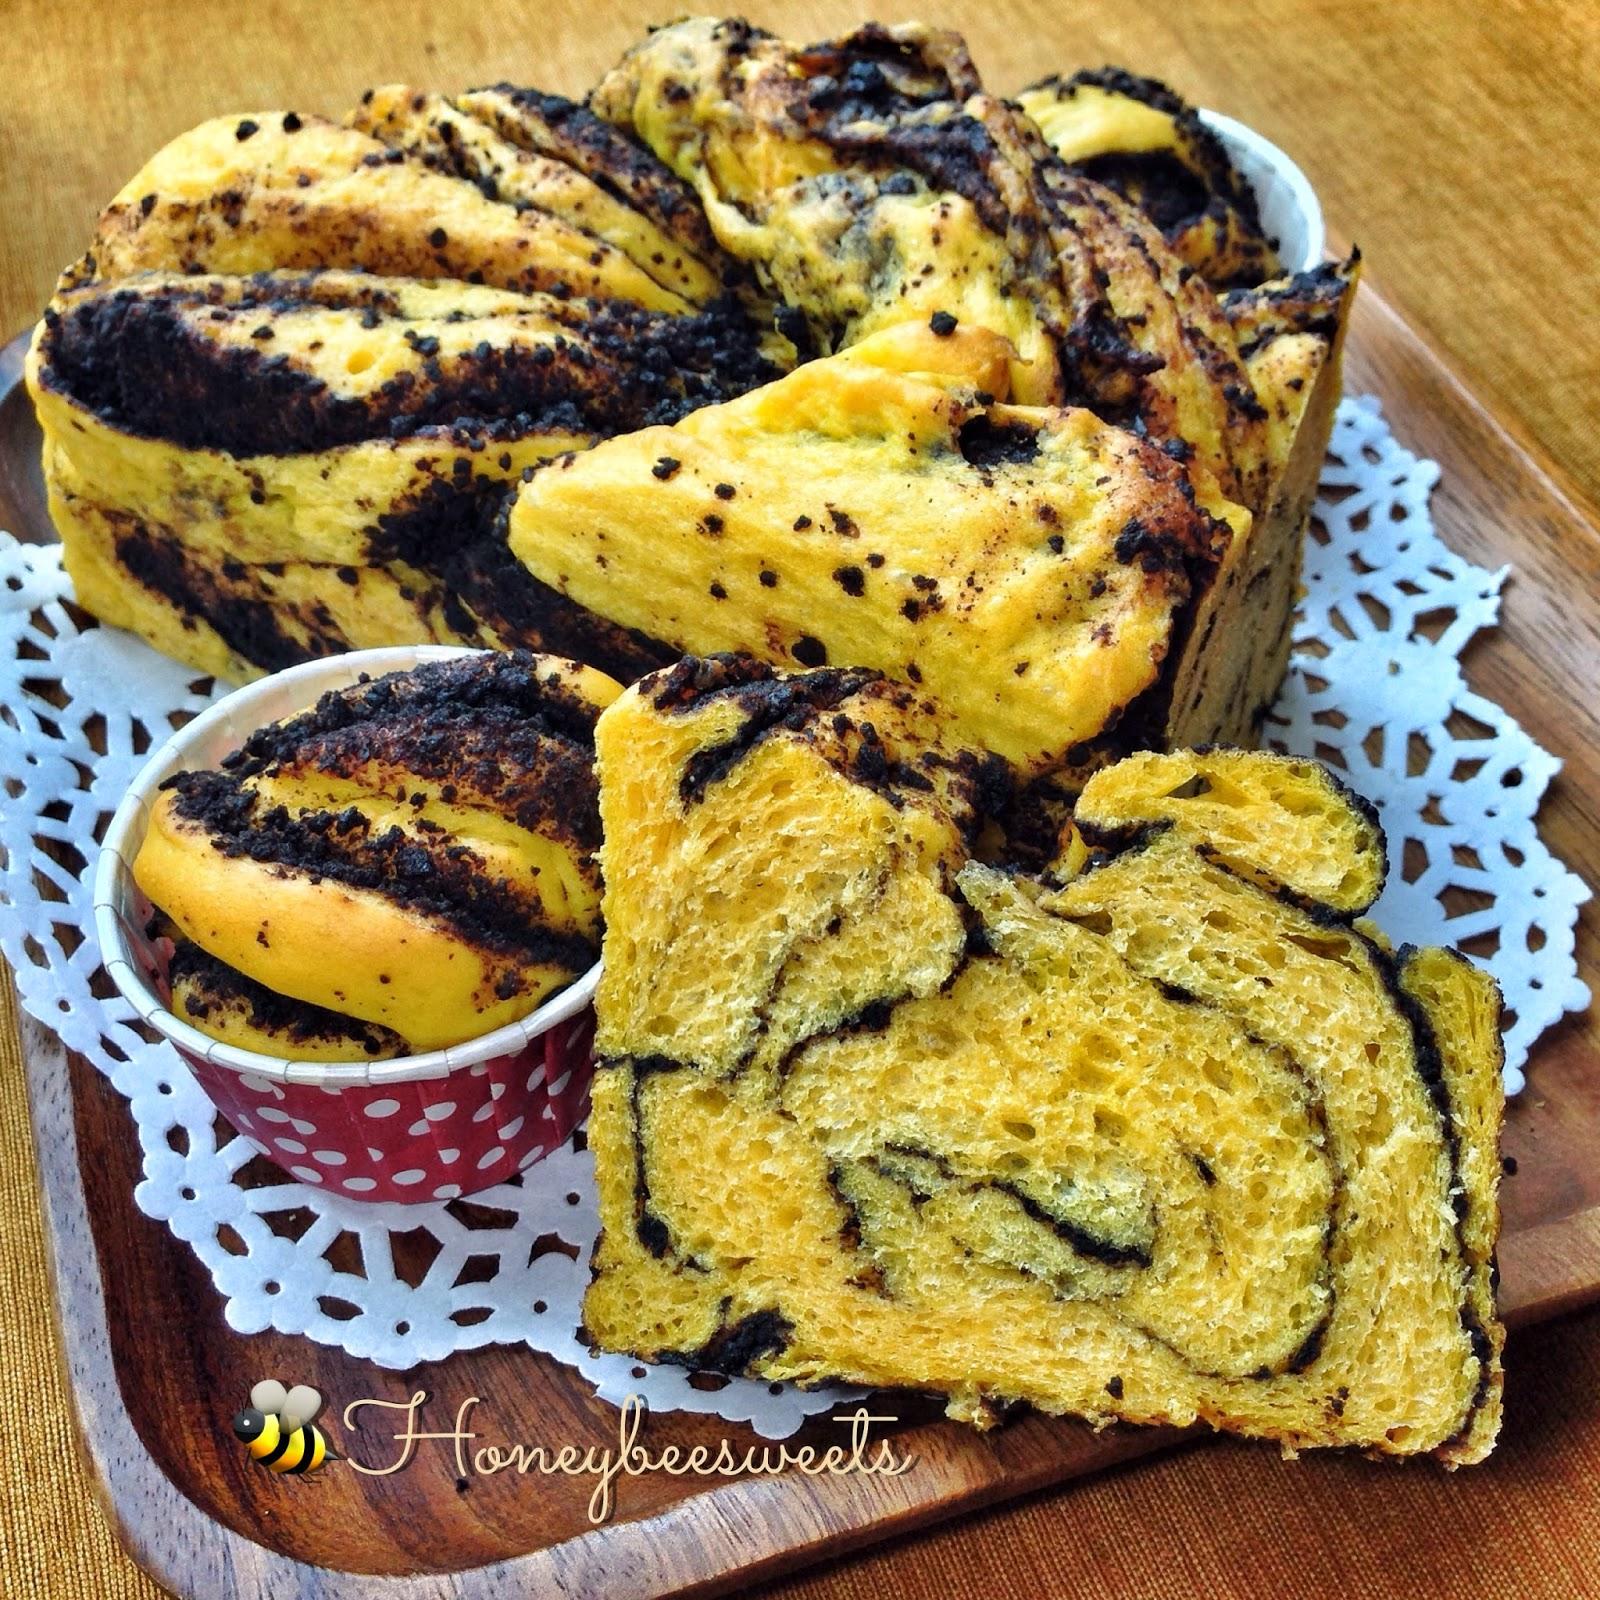 Honey Bee Sweets: Sweet Potato Bread with Oreo Crumb Filling